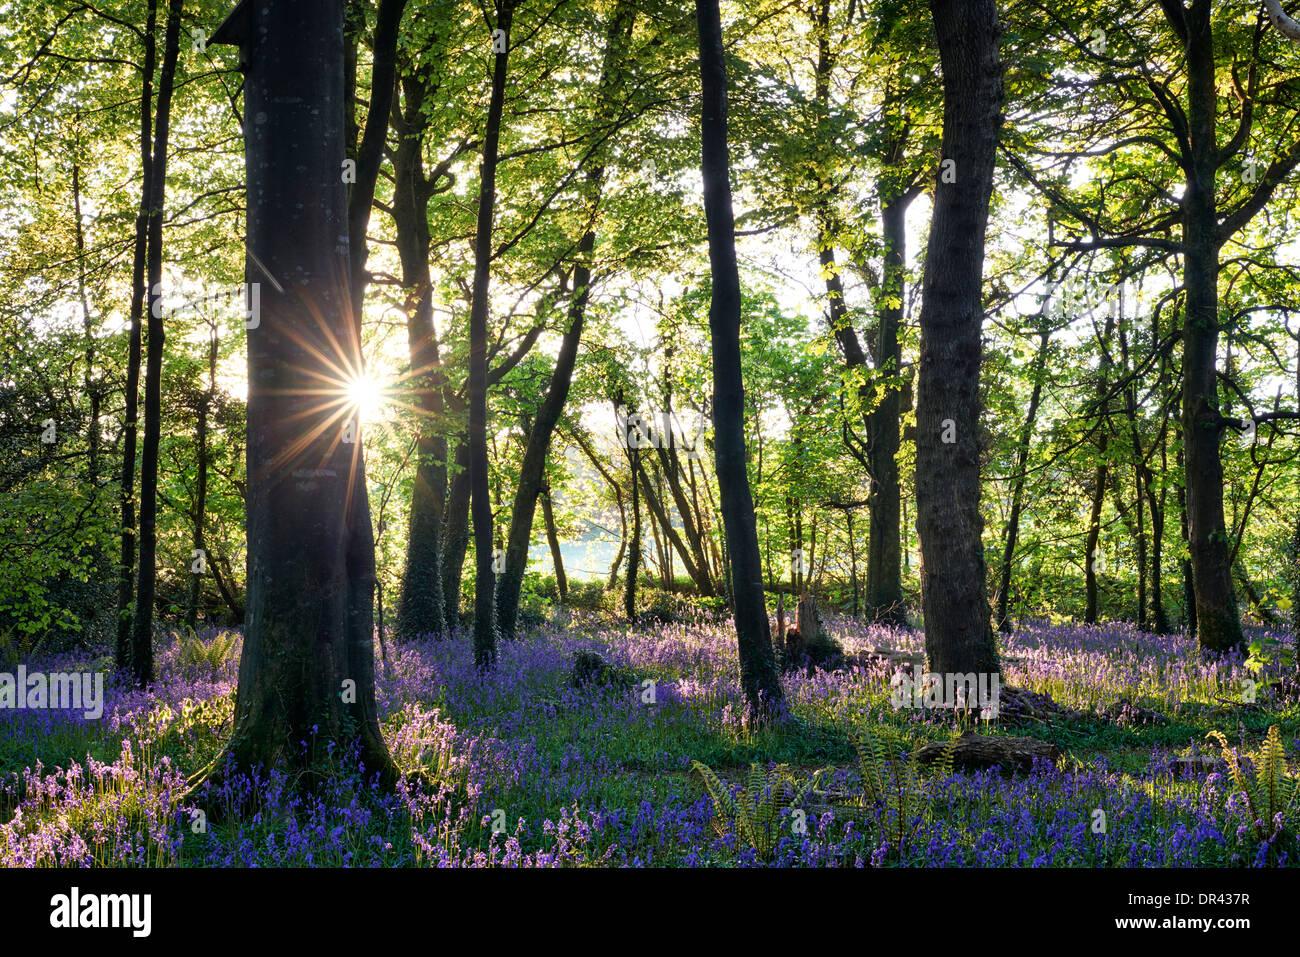 Sun bursting through the trees casting shadows over a carpet of bluebells - Stock Image